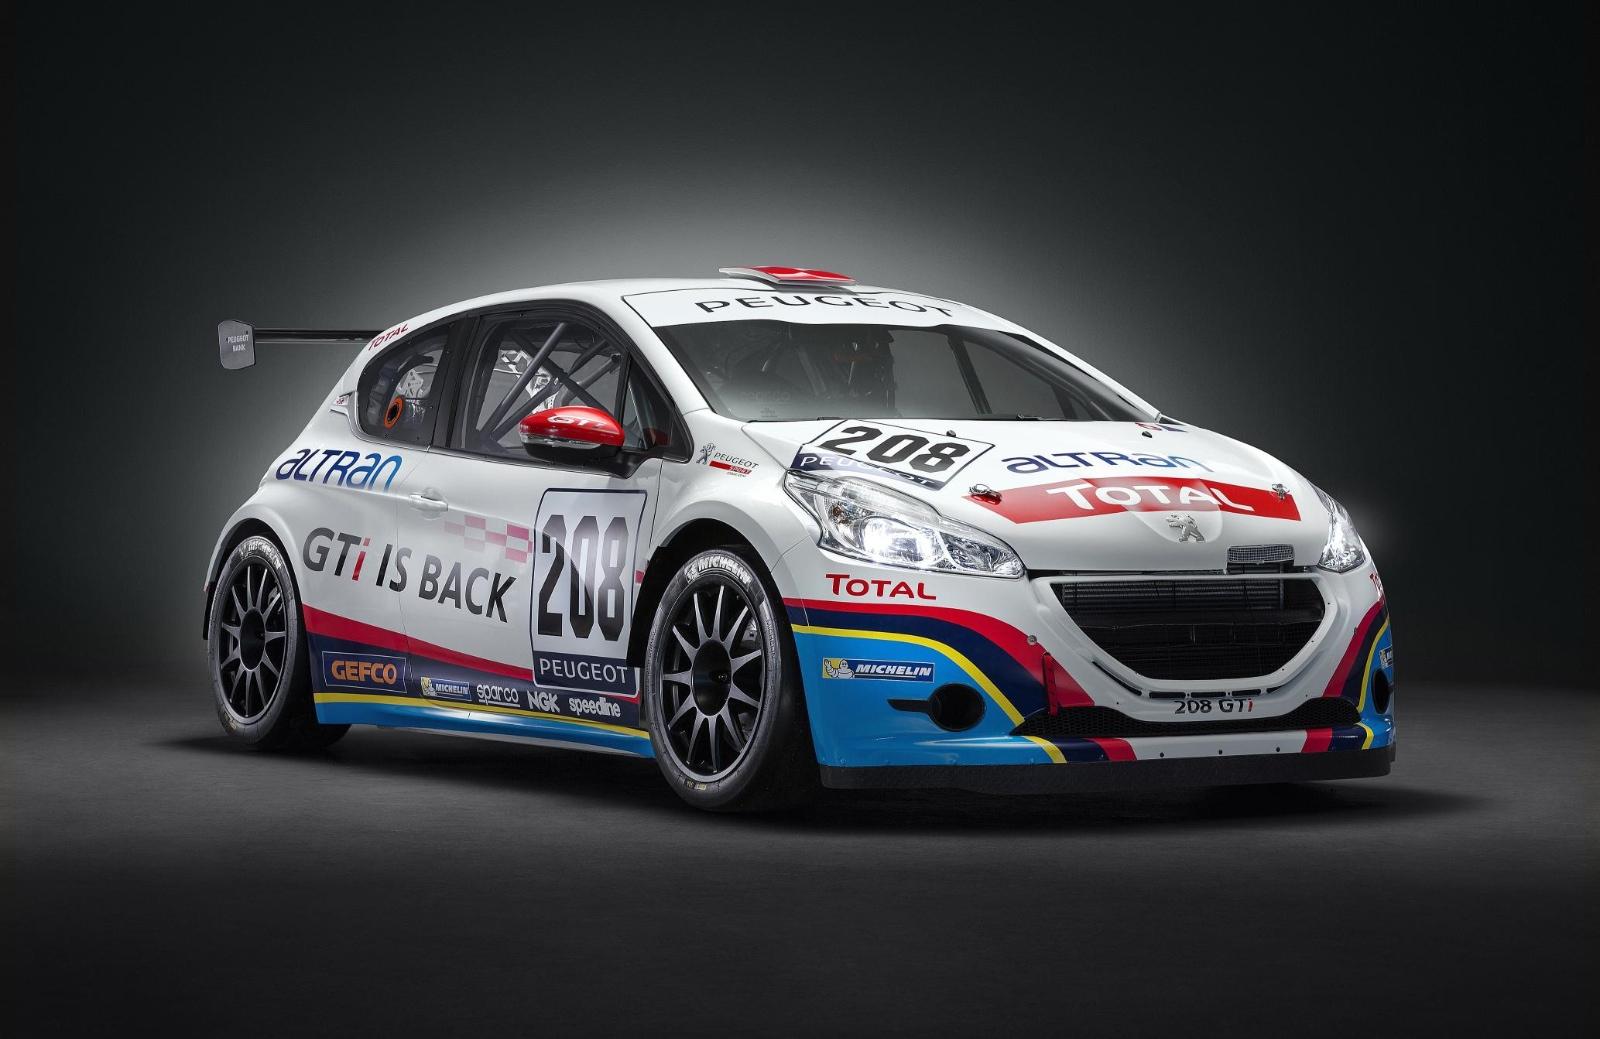 peugeot 208 gti to race at nurburgring autoevolution. Black Bedroom Furniture Sets. Home Design Ideas